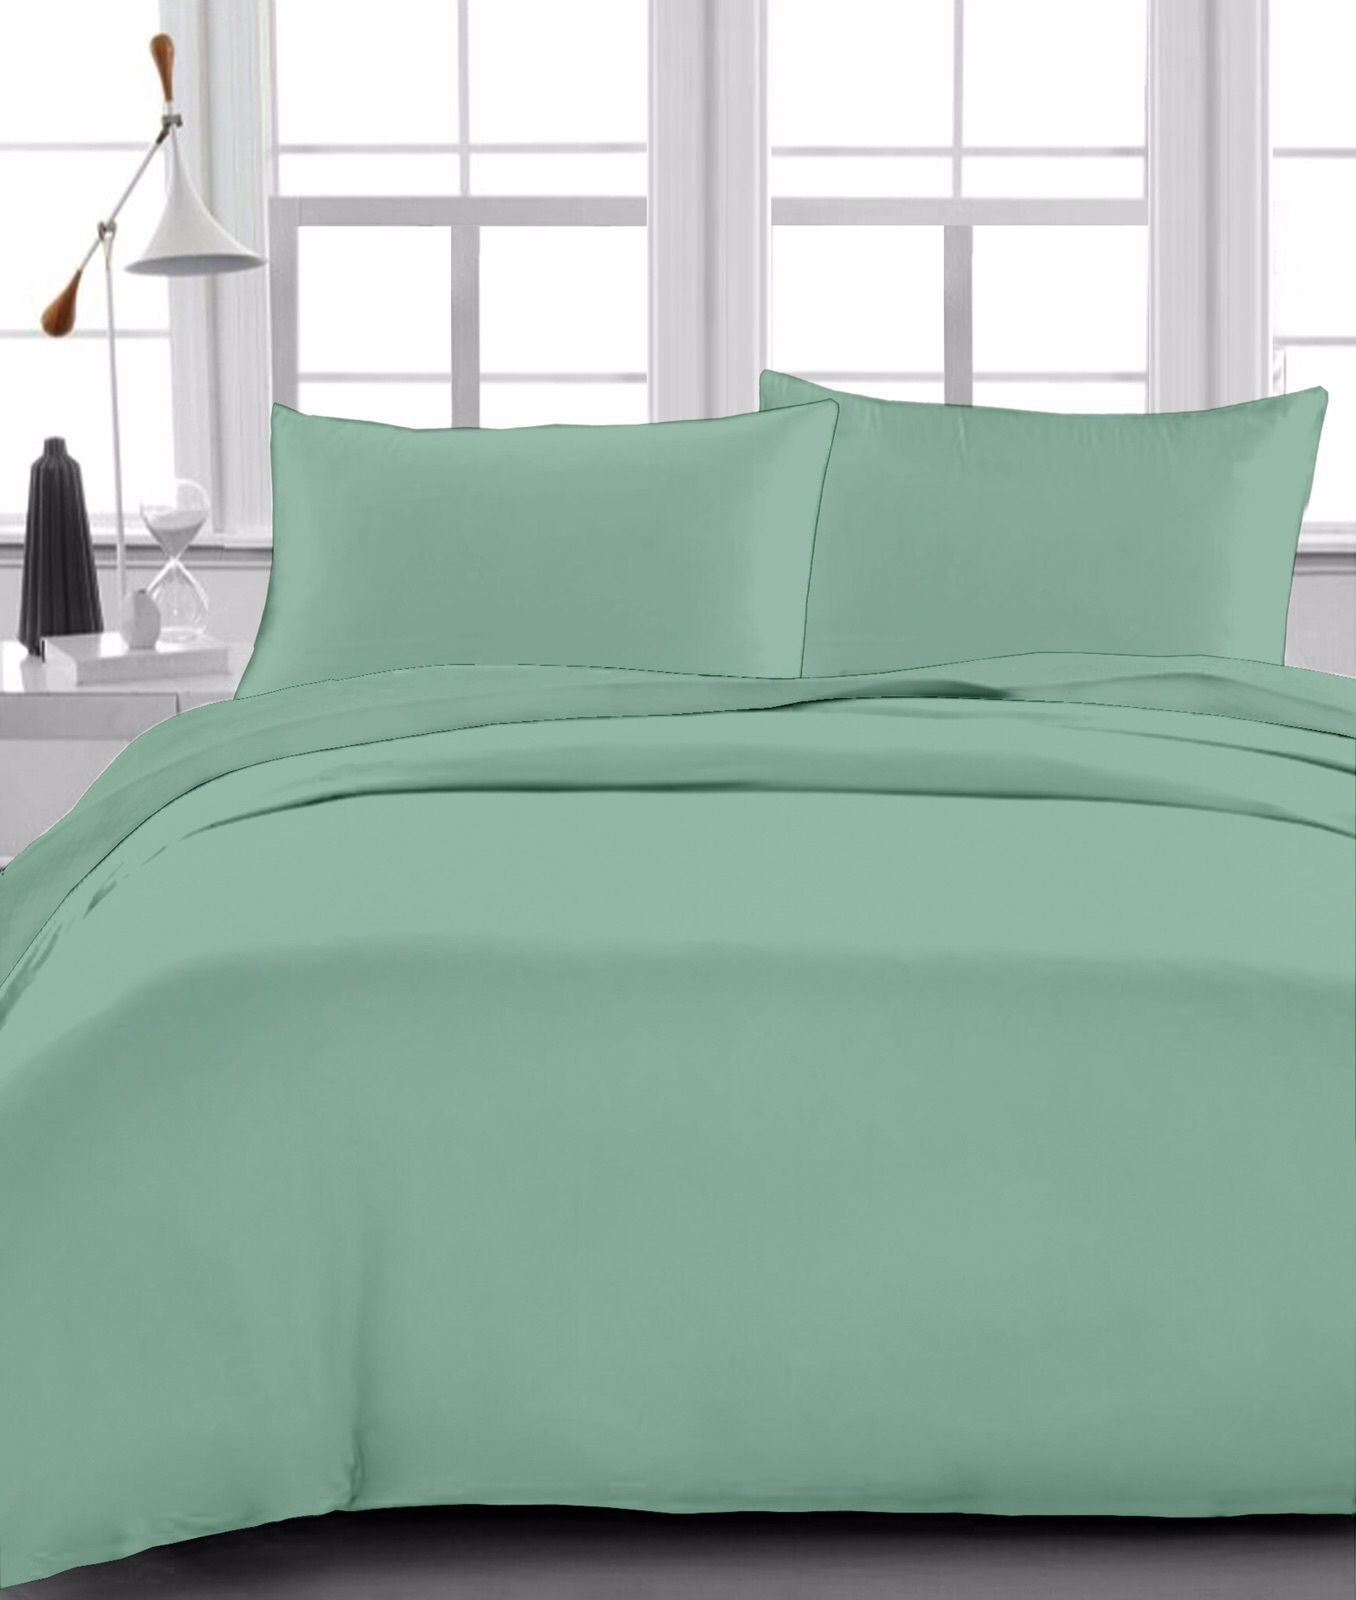 1 Qty Soft Ed Sheet 100 Egyptian Cotton 1000 Tc Drop 23 30 Moss Solid